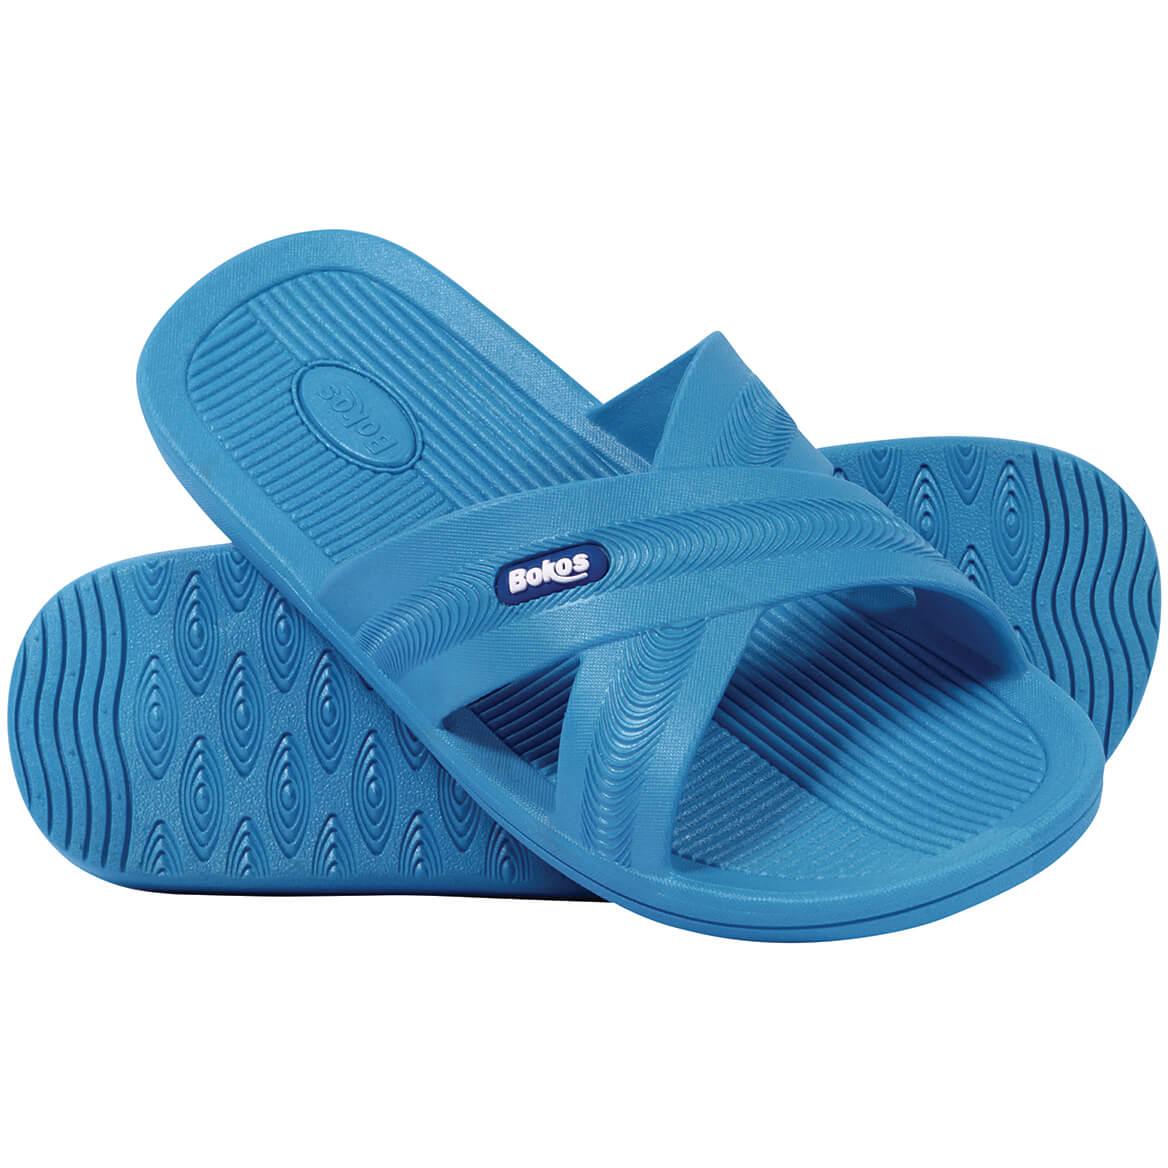 8b5e25f1d56 Bokos Women s Rubber Sandals-359229 Bokos Women s Rubber Sandals-359229